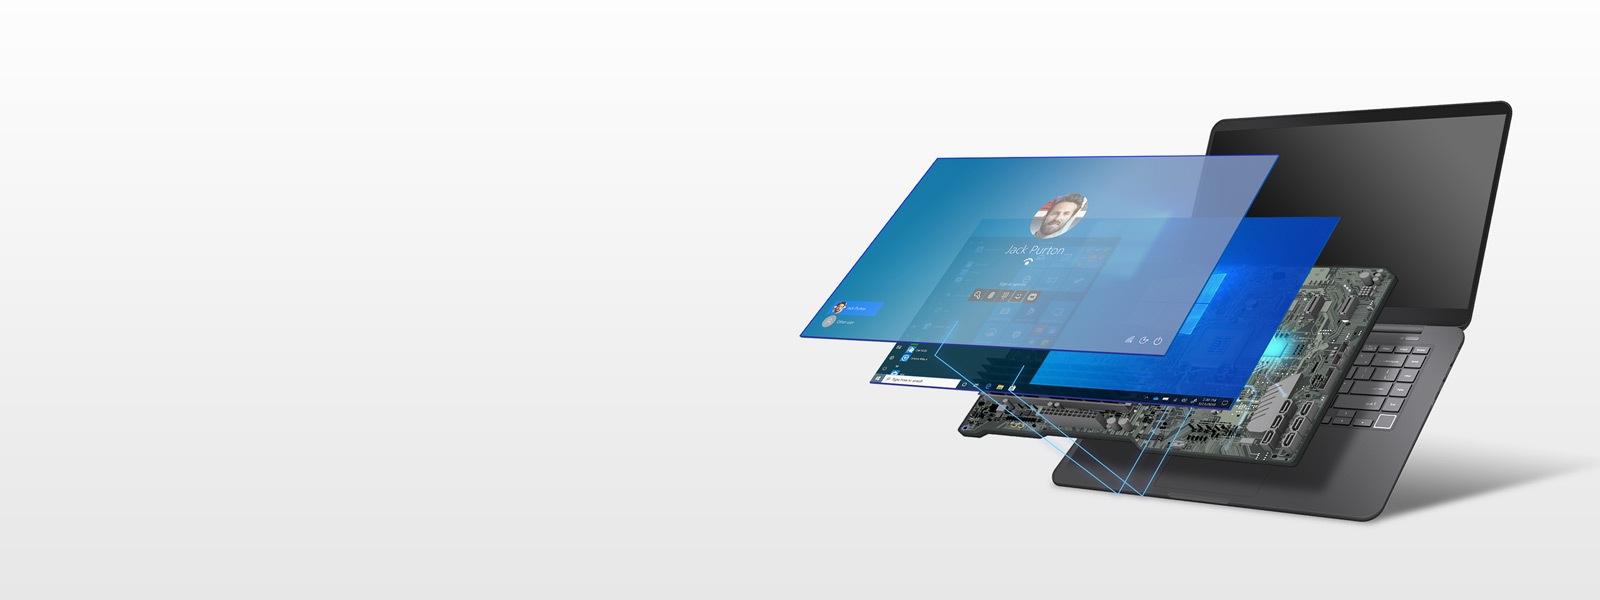 Windows 10 secured-core PC